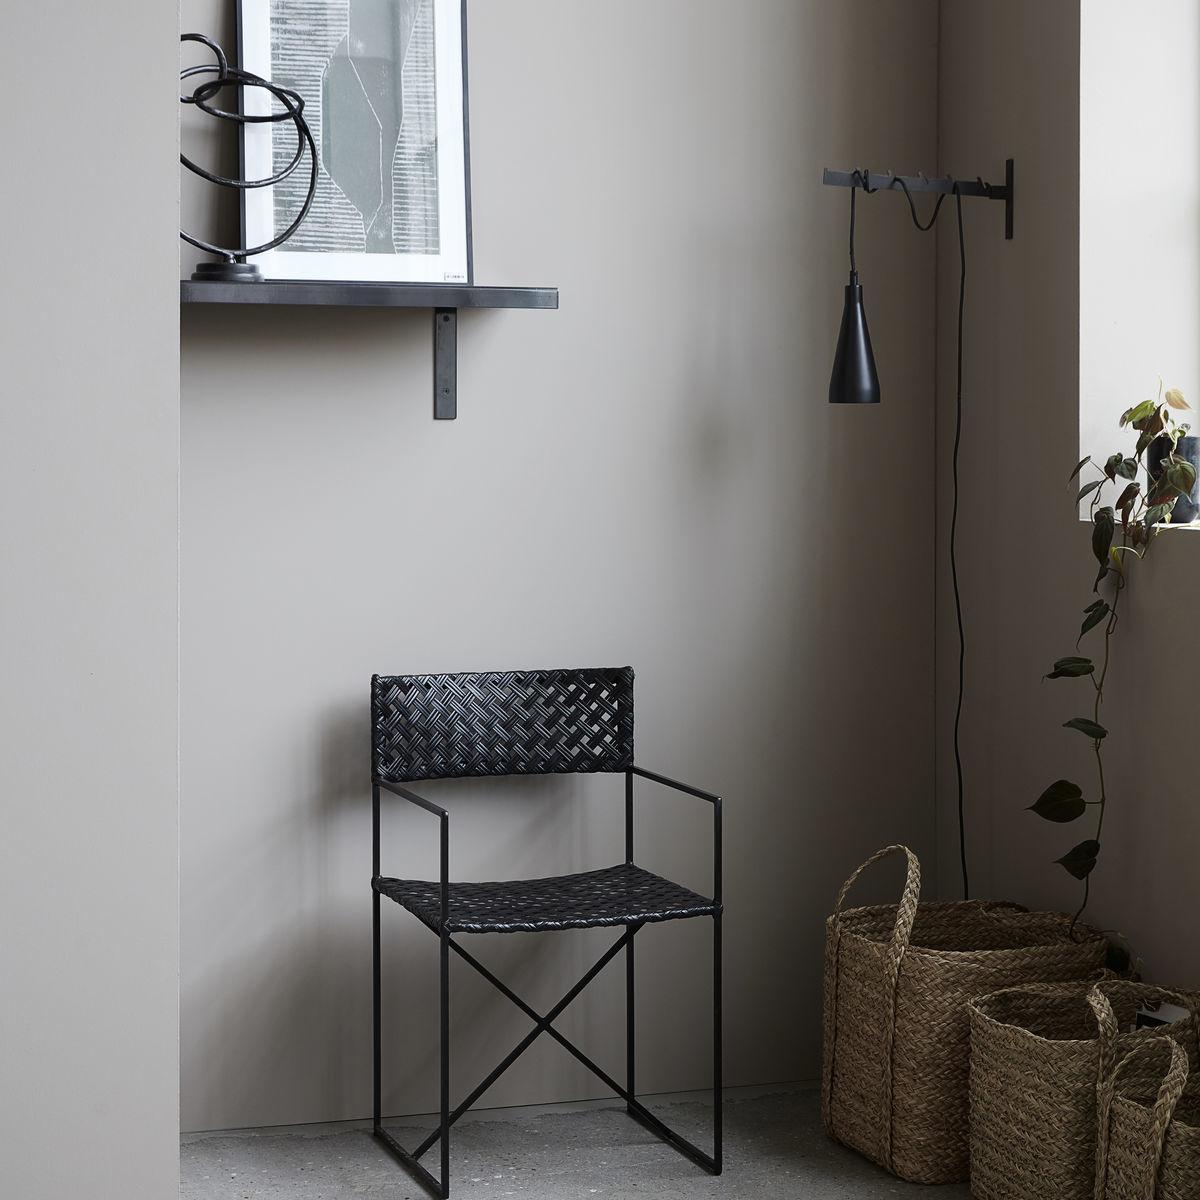 House Doctor Hanging lamp Jammu - black iron - Ø9Xh23,5cm - House Doctor